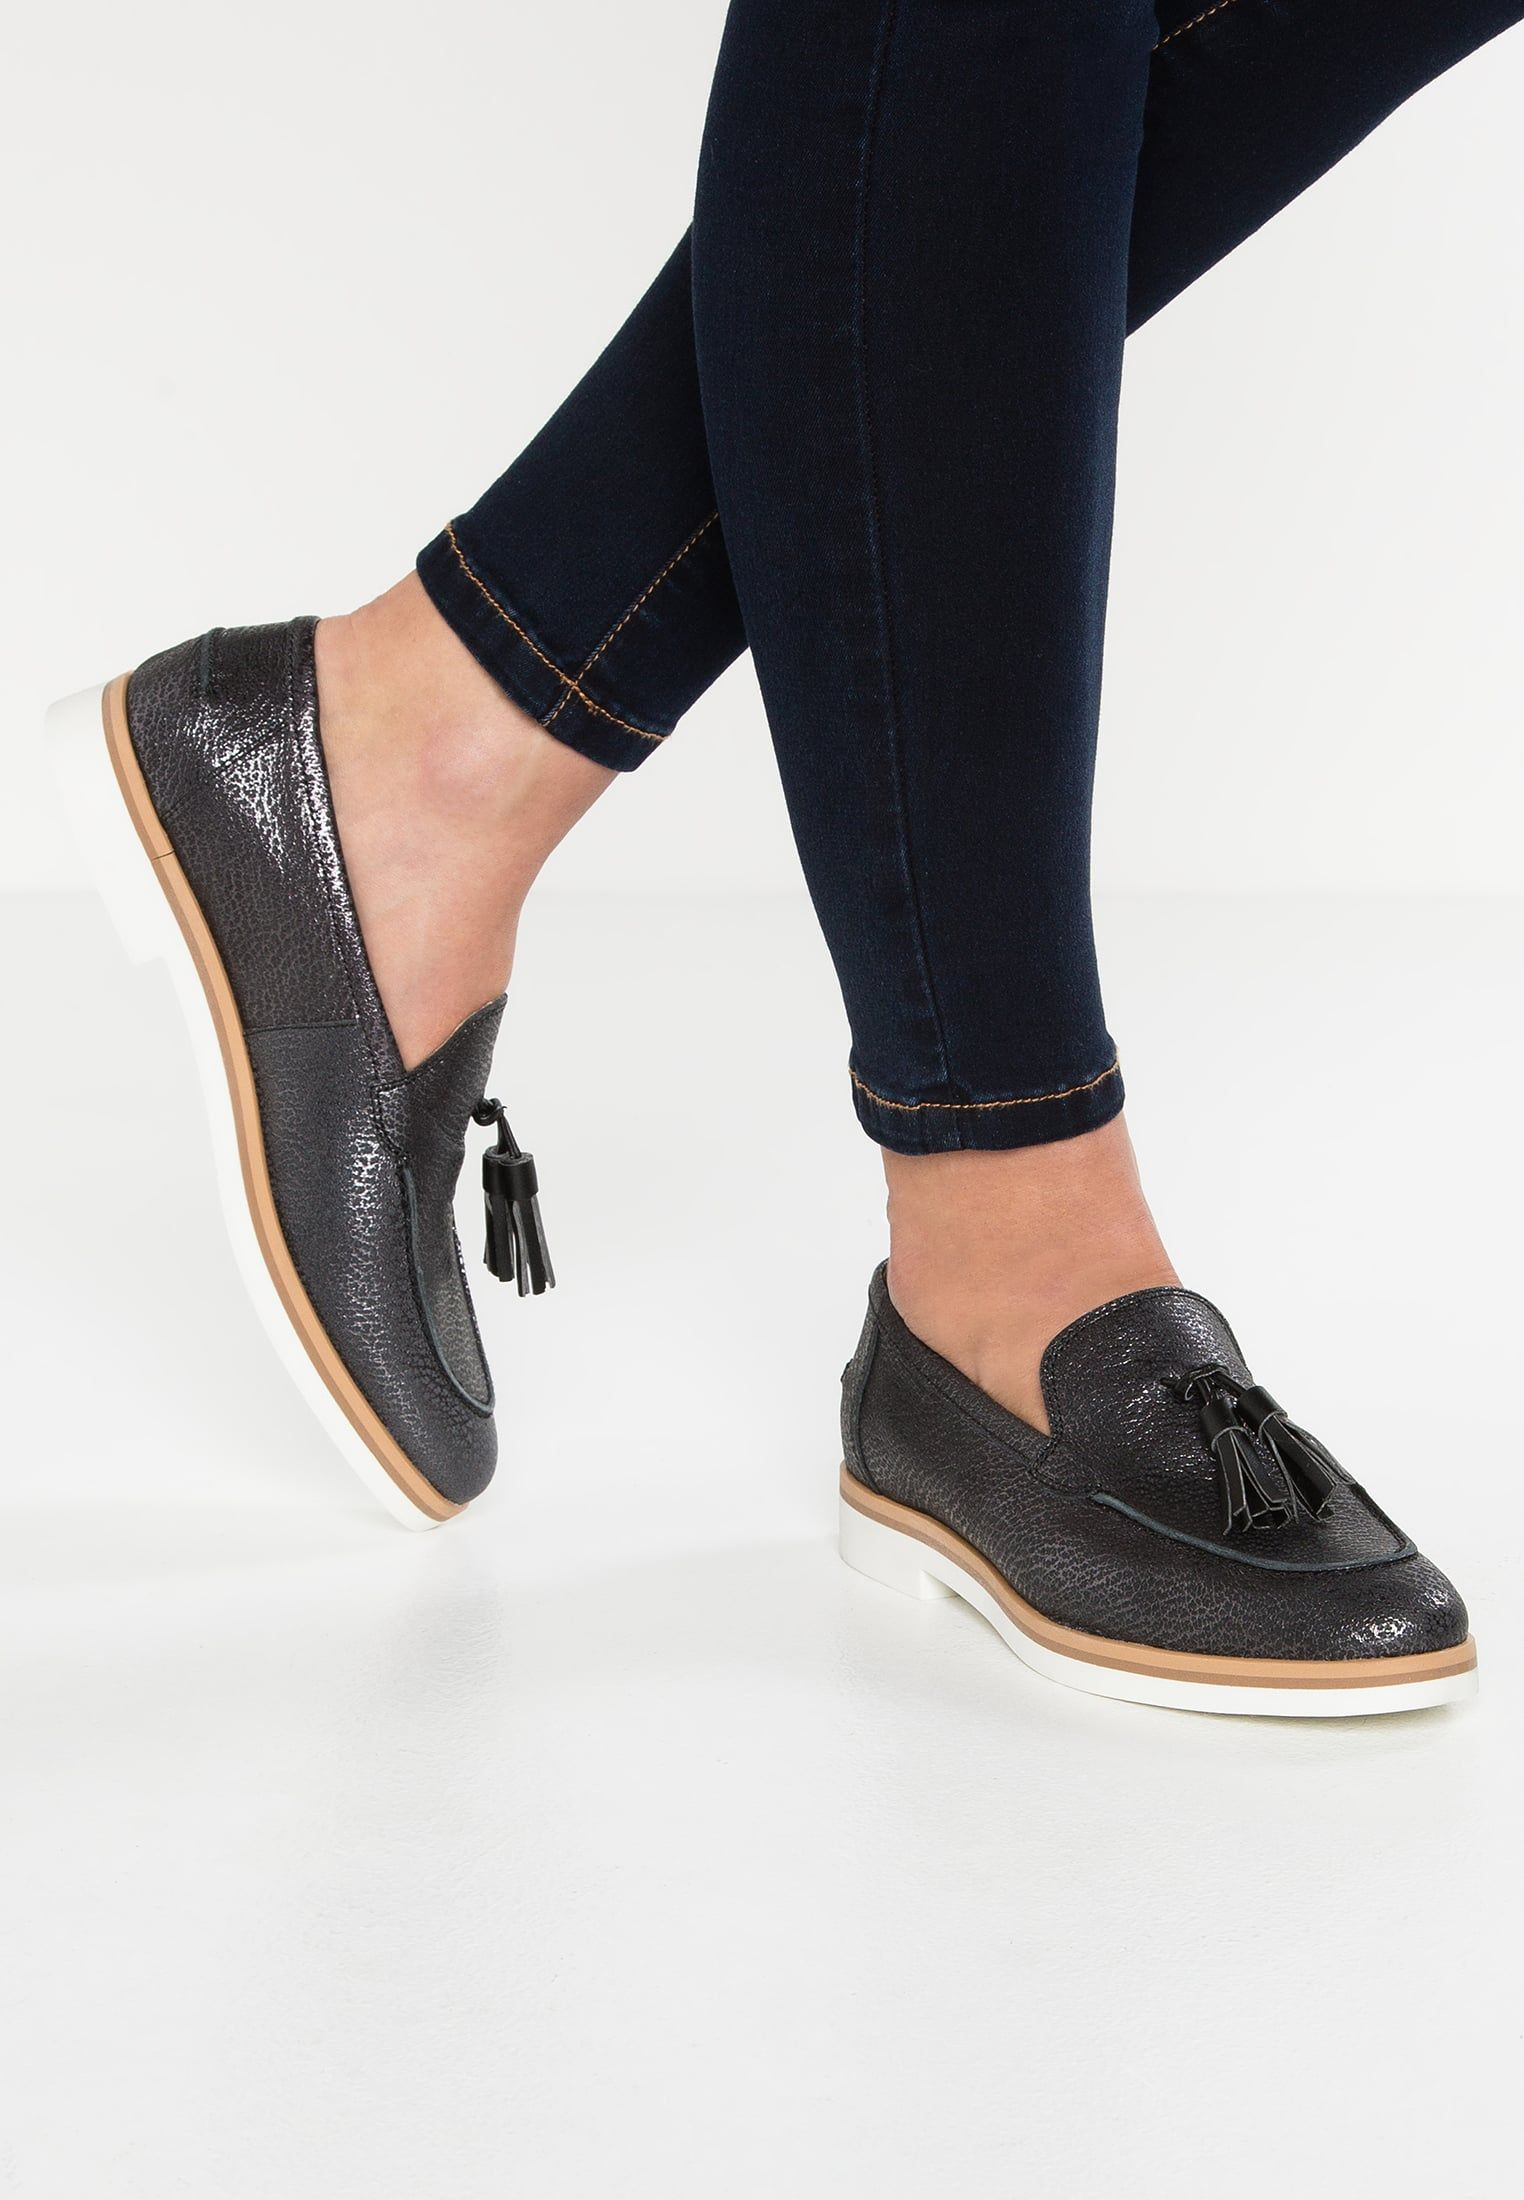 Escultor Marcha atrás Conciso  Geox RESPIRA Precios y modelos   Zapatos de moda, Modelos de ...